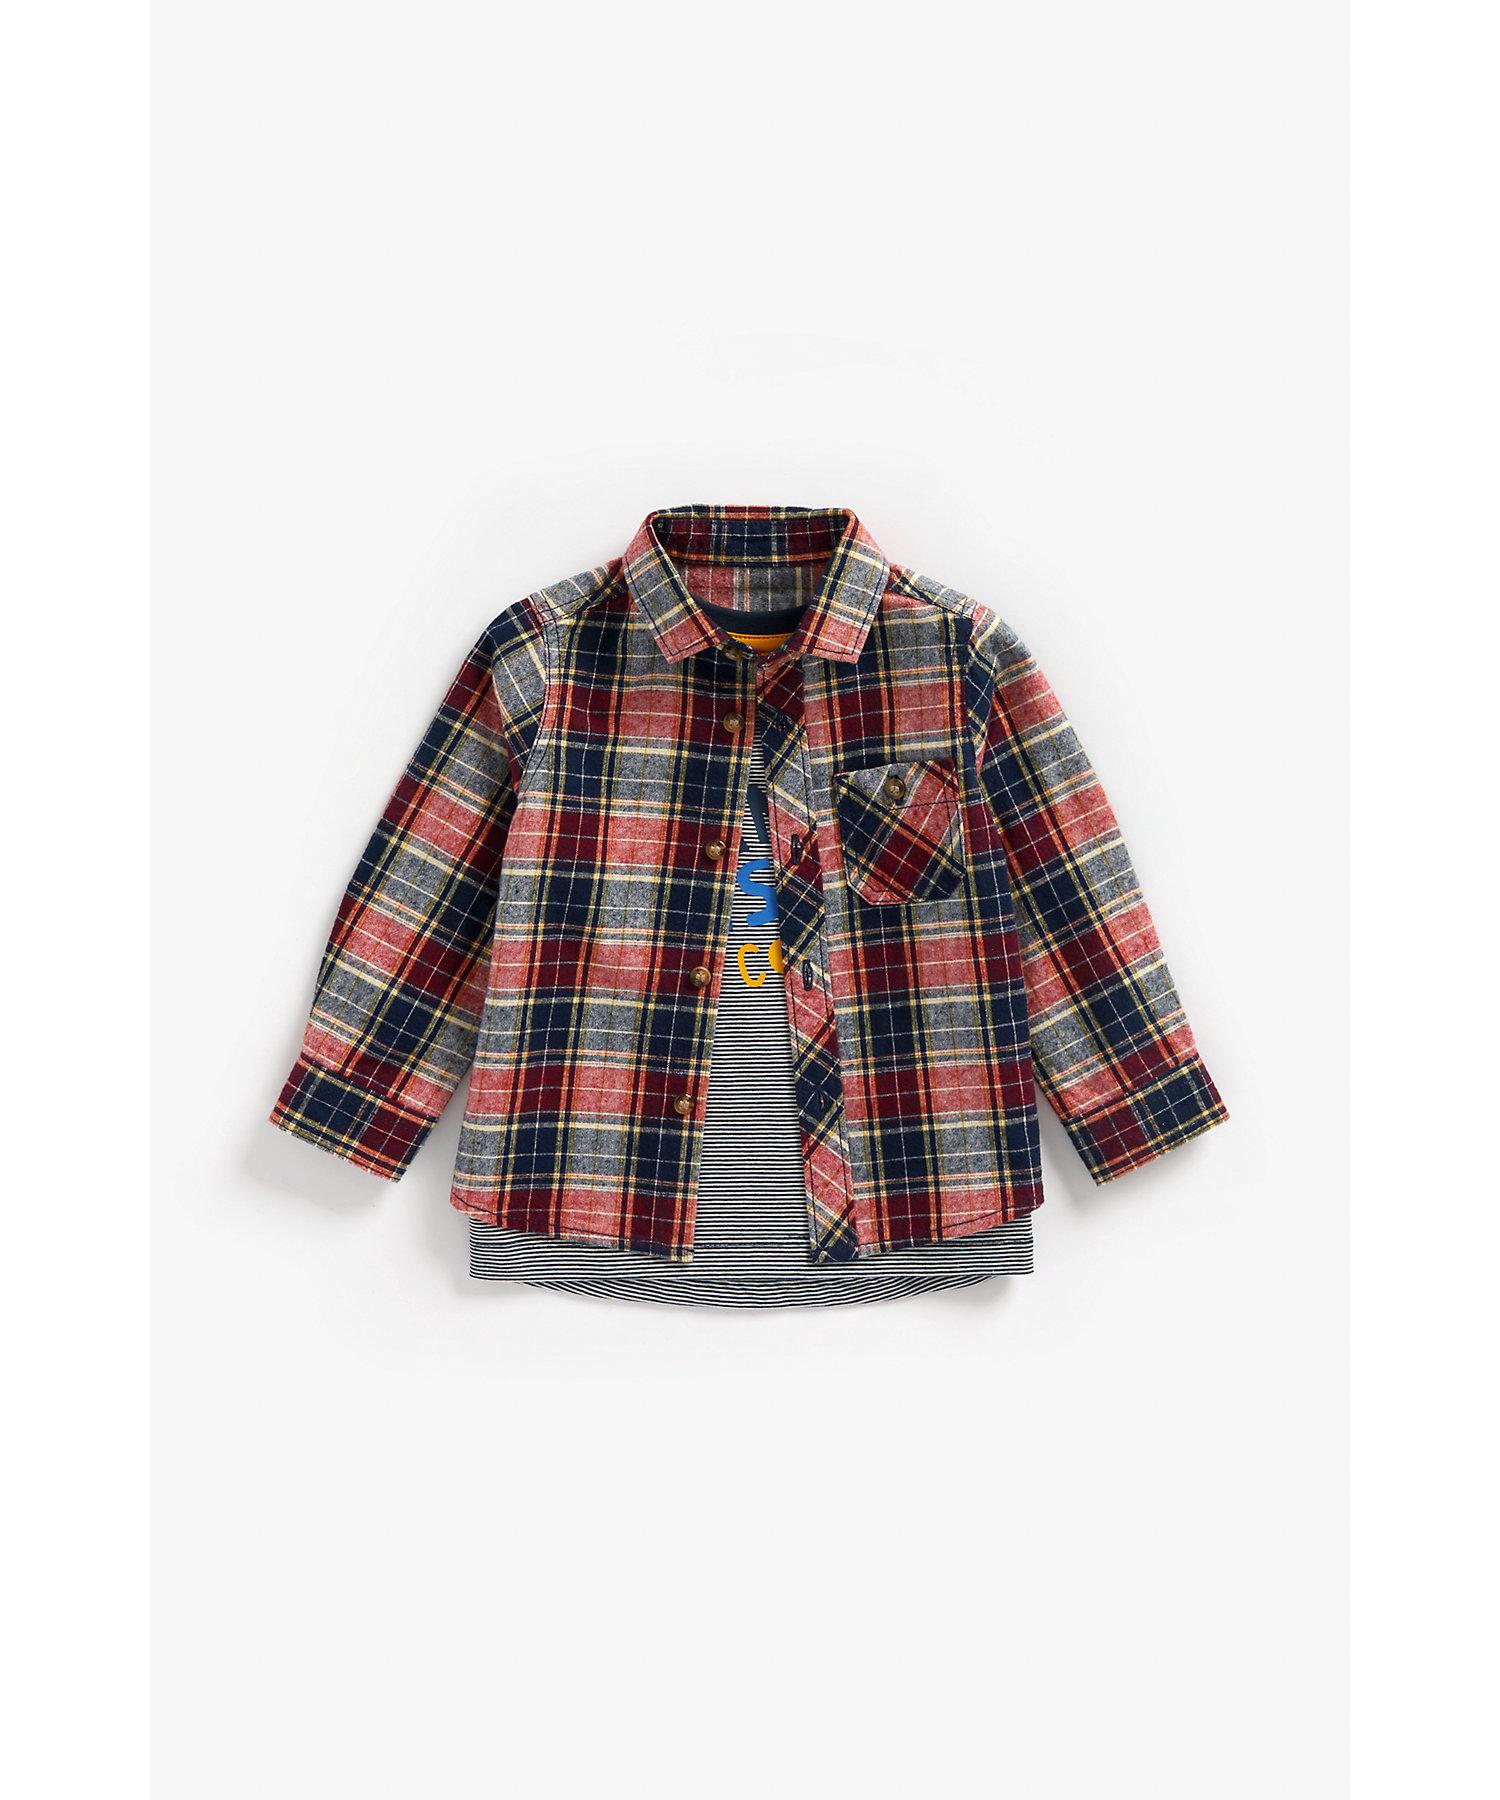 Mothercare | Boys Full Sleeves Check Shirt And Tee Set Slogan Print - Multicolor